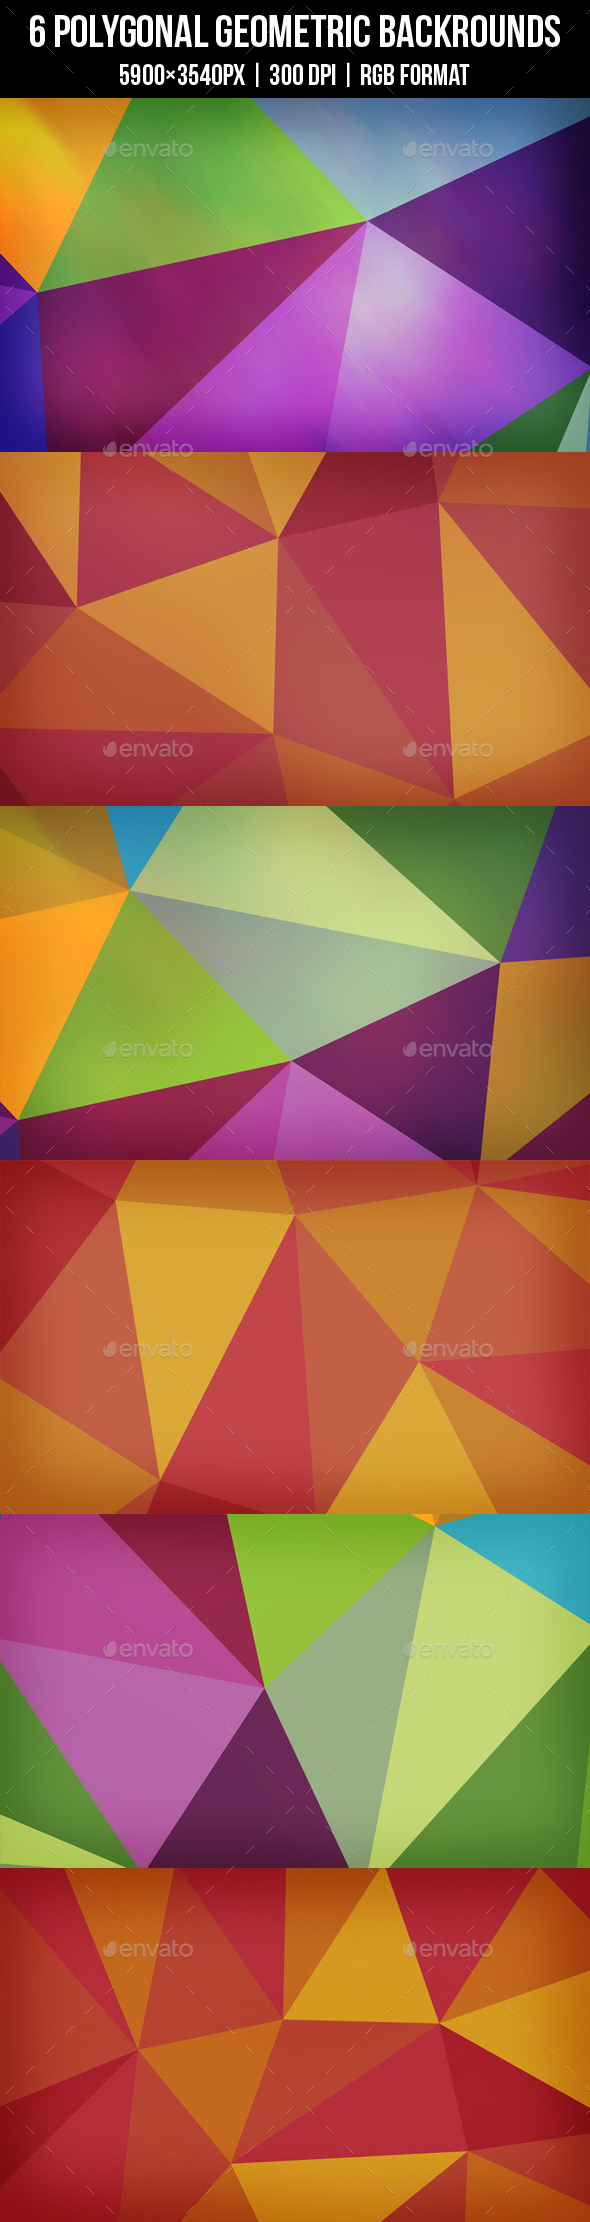 6 Polygonal Backgrounds